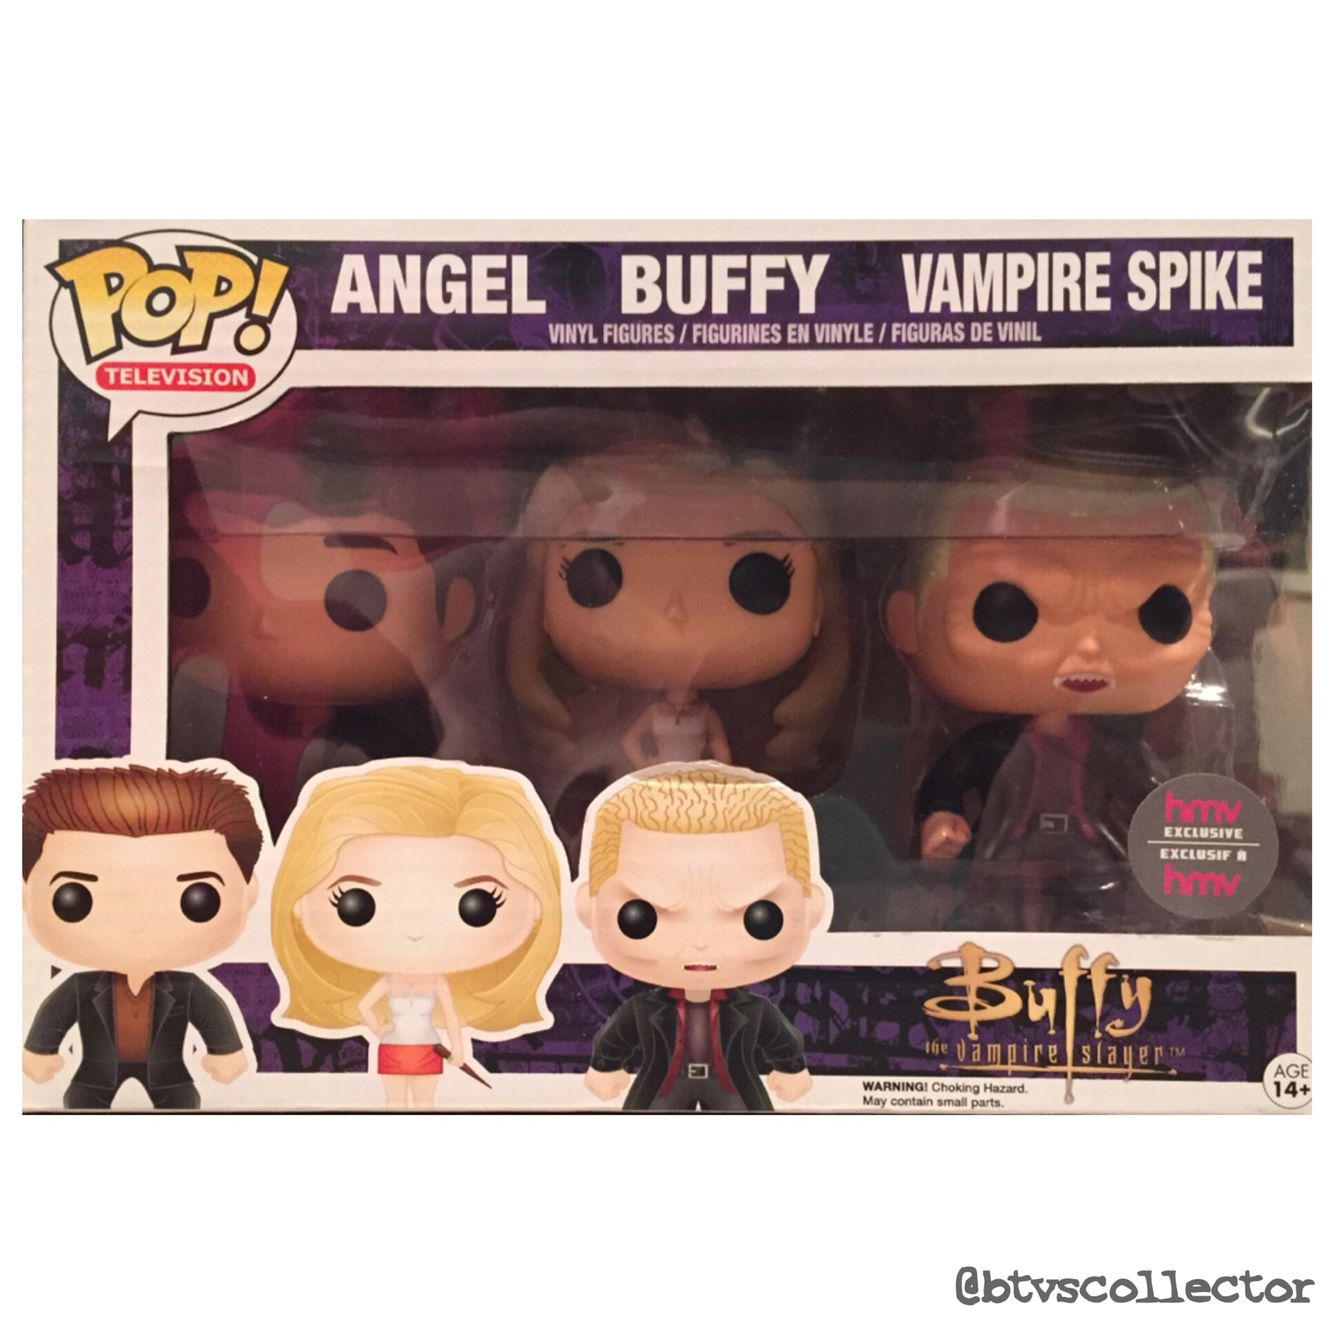 Funko Pop Vinyl Hmv Canadian Exclusive Buffy Angel Vampire Spike 3 Pack Btvscollector Btvs Buffy Buffythevampireslayer Funko Pop Dolls Pop Vinyl Figures Pop Dolls